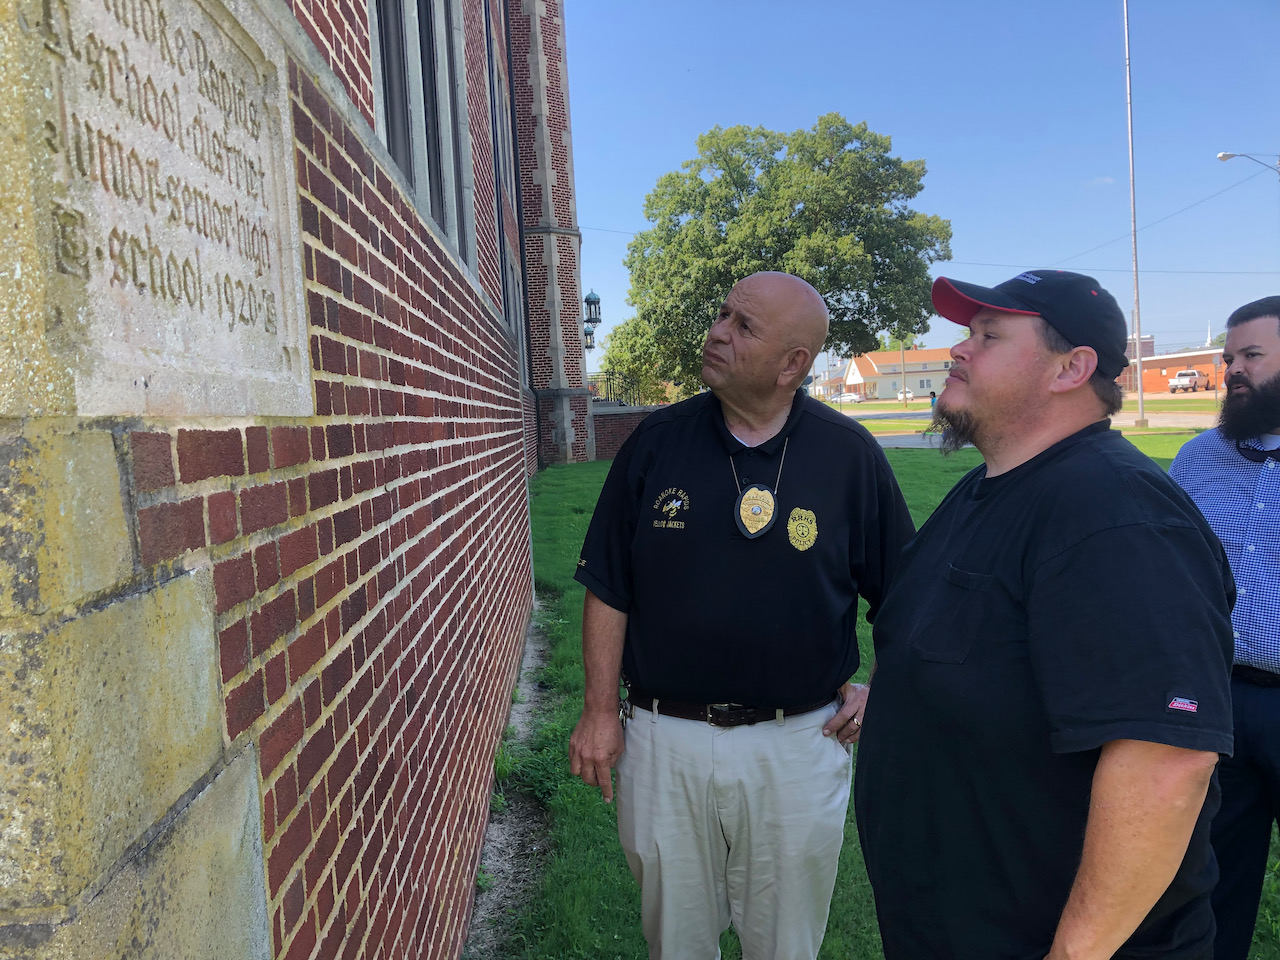 North Carolina/U.S. - Then and now, Masons to oversee RRHS cornerstone ceremony